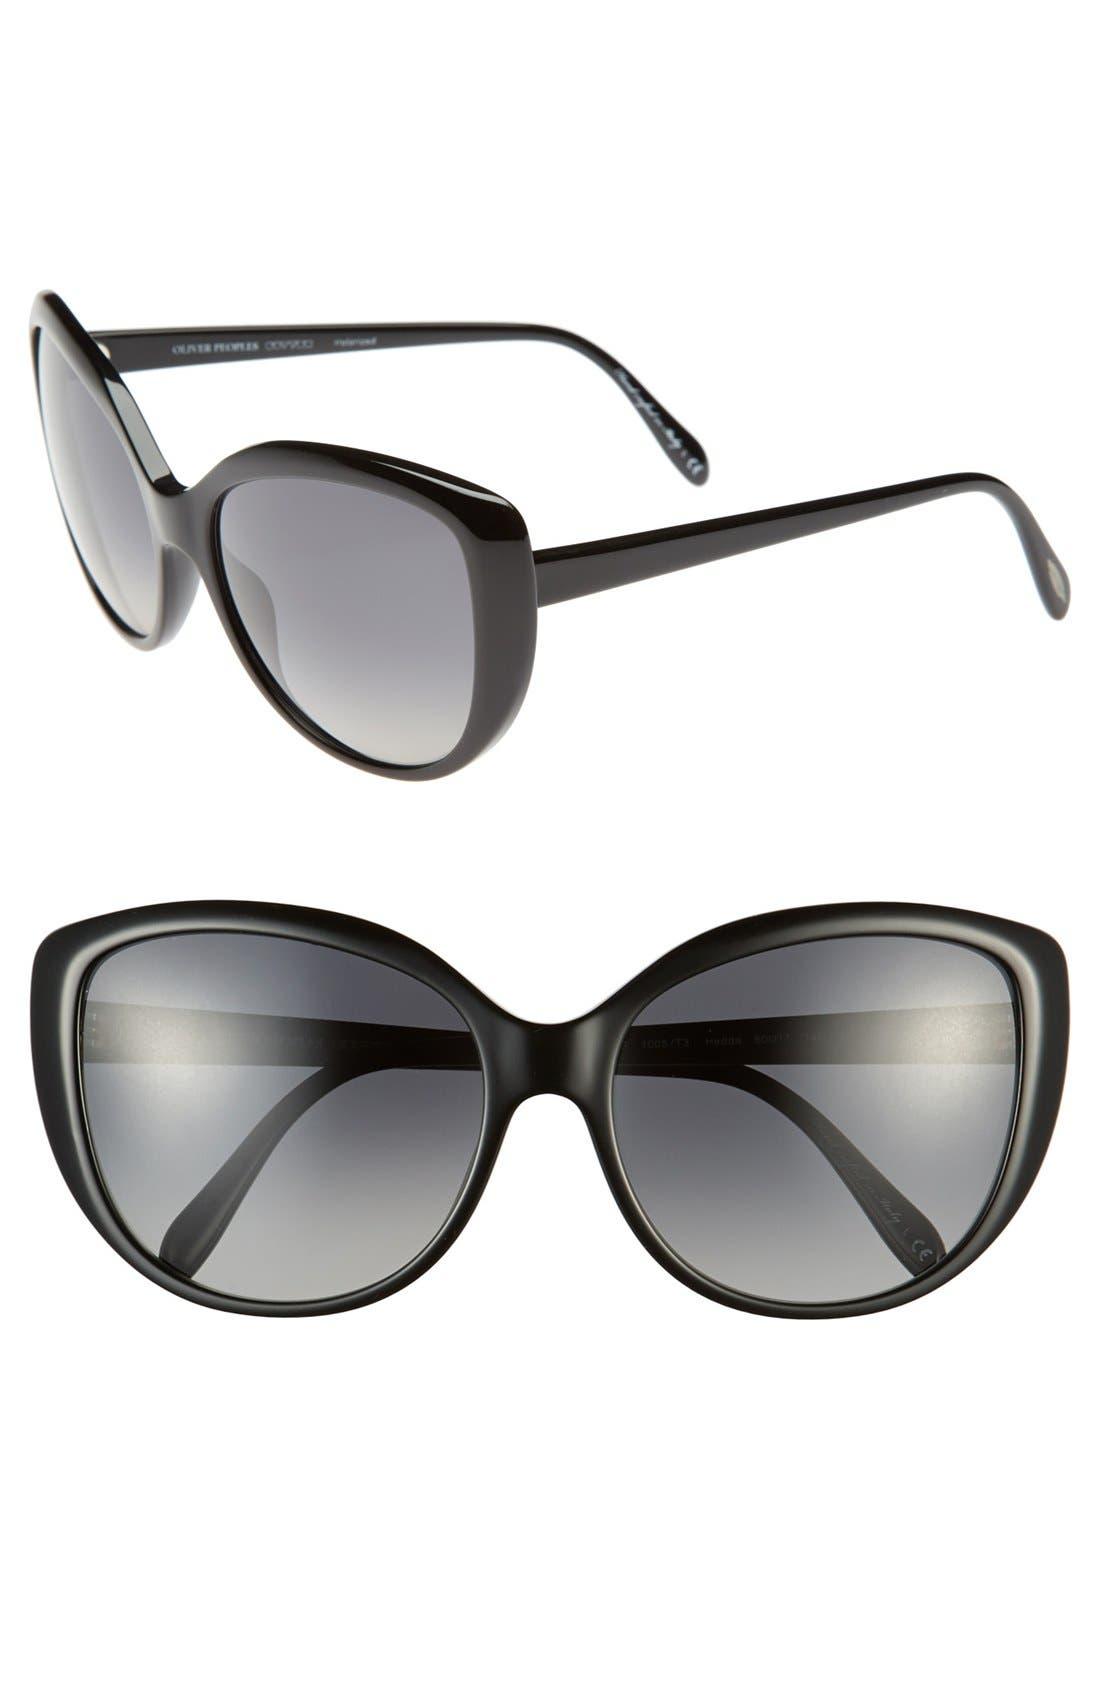 Alternate Image 1 Selected - Oliver Peoples 'Hedda' 60mm Polarized Sunglasses